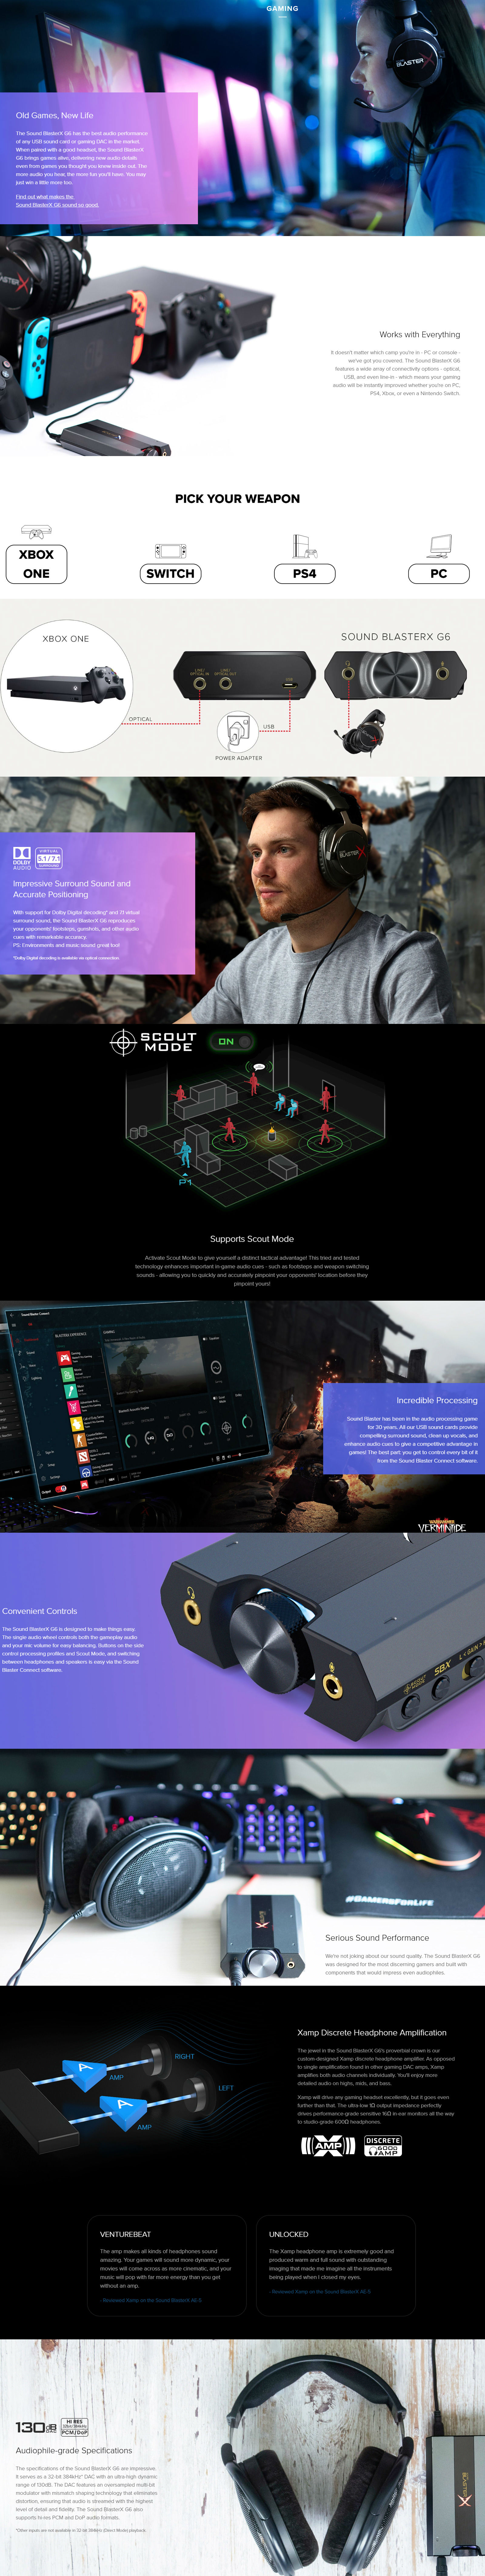 Creative Sound BlasterX G6 External Gaming Sound Card